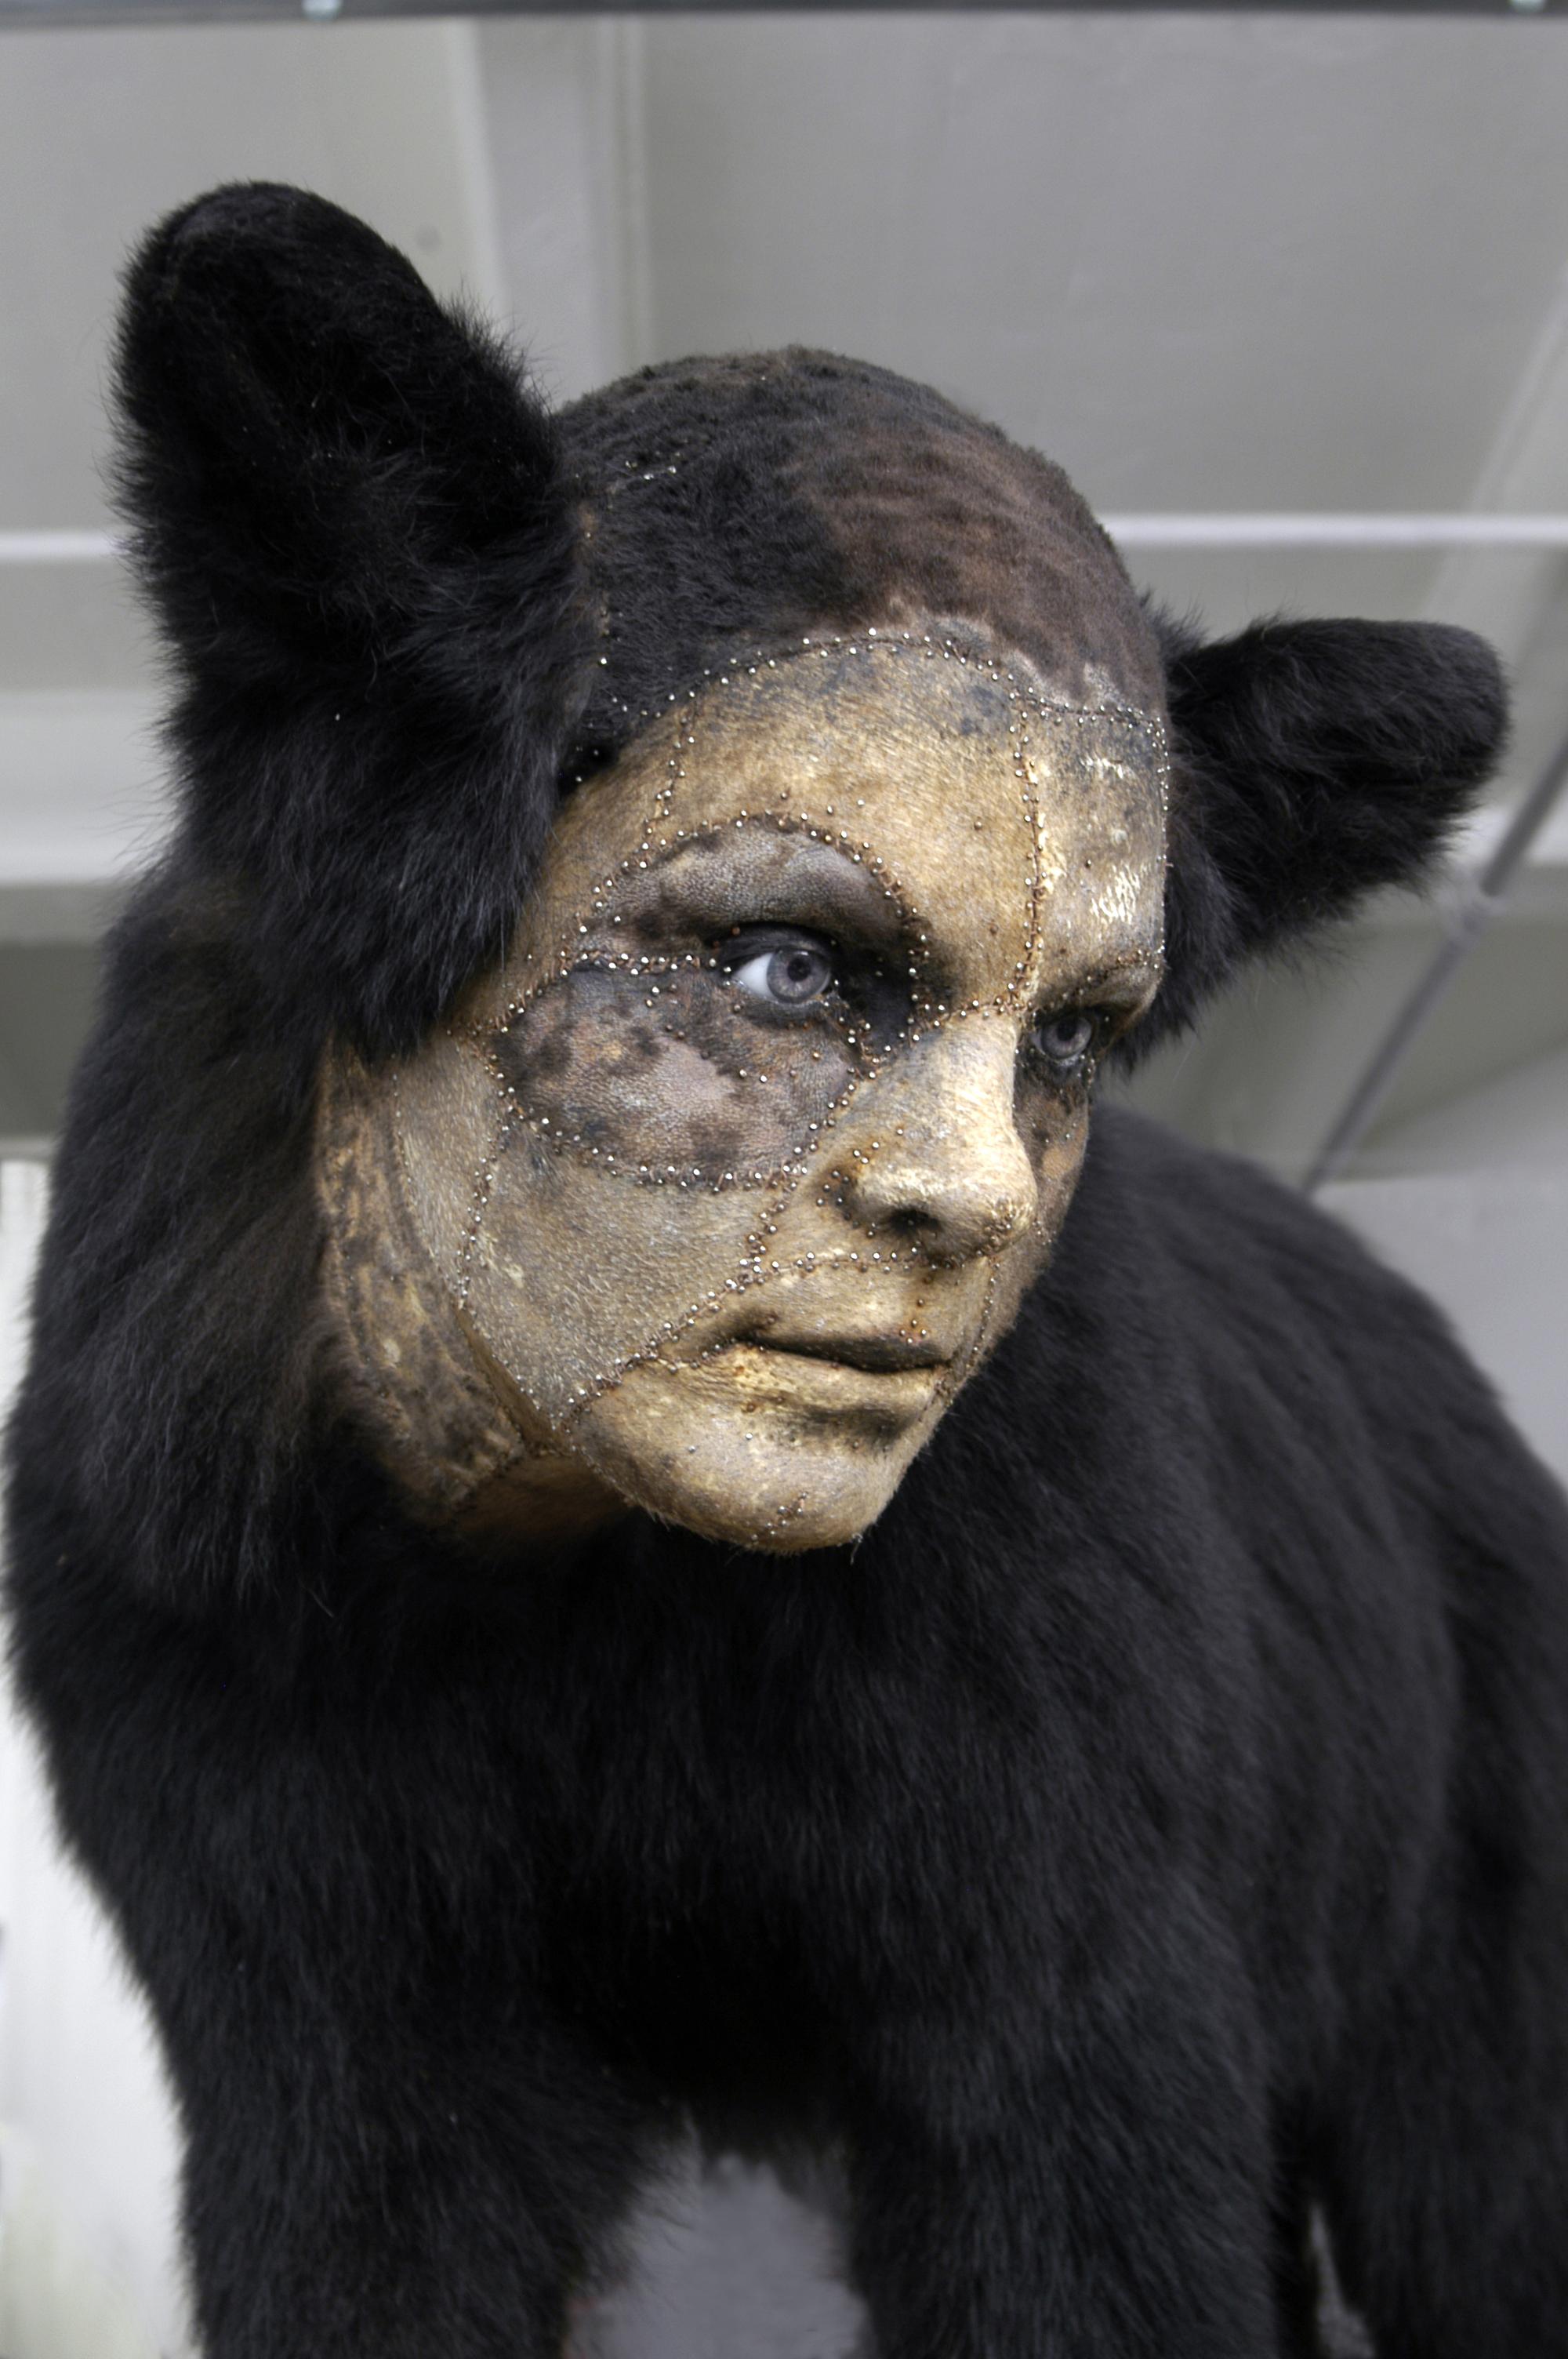 Untitled Black Bear detailbear.jpg